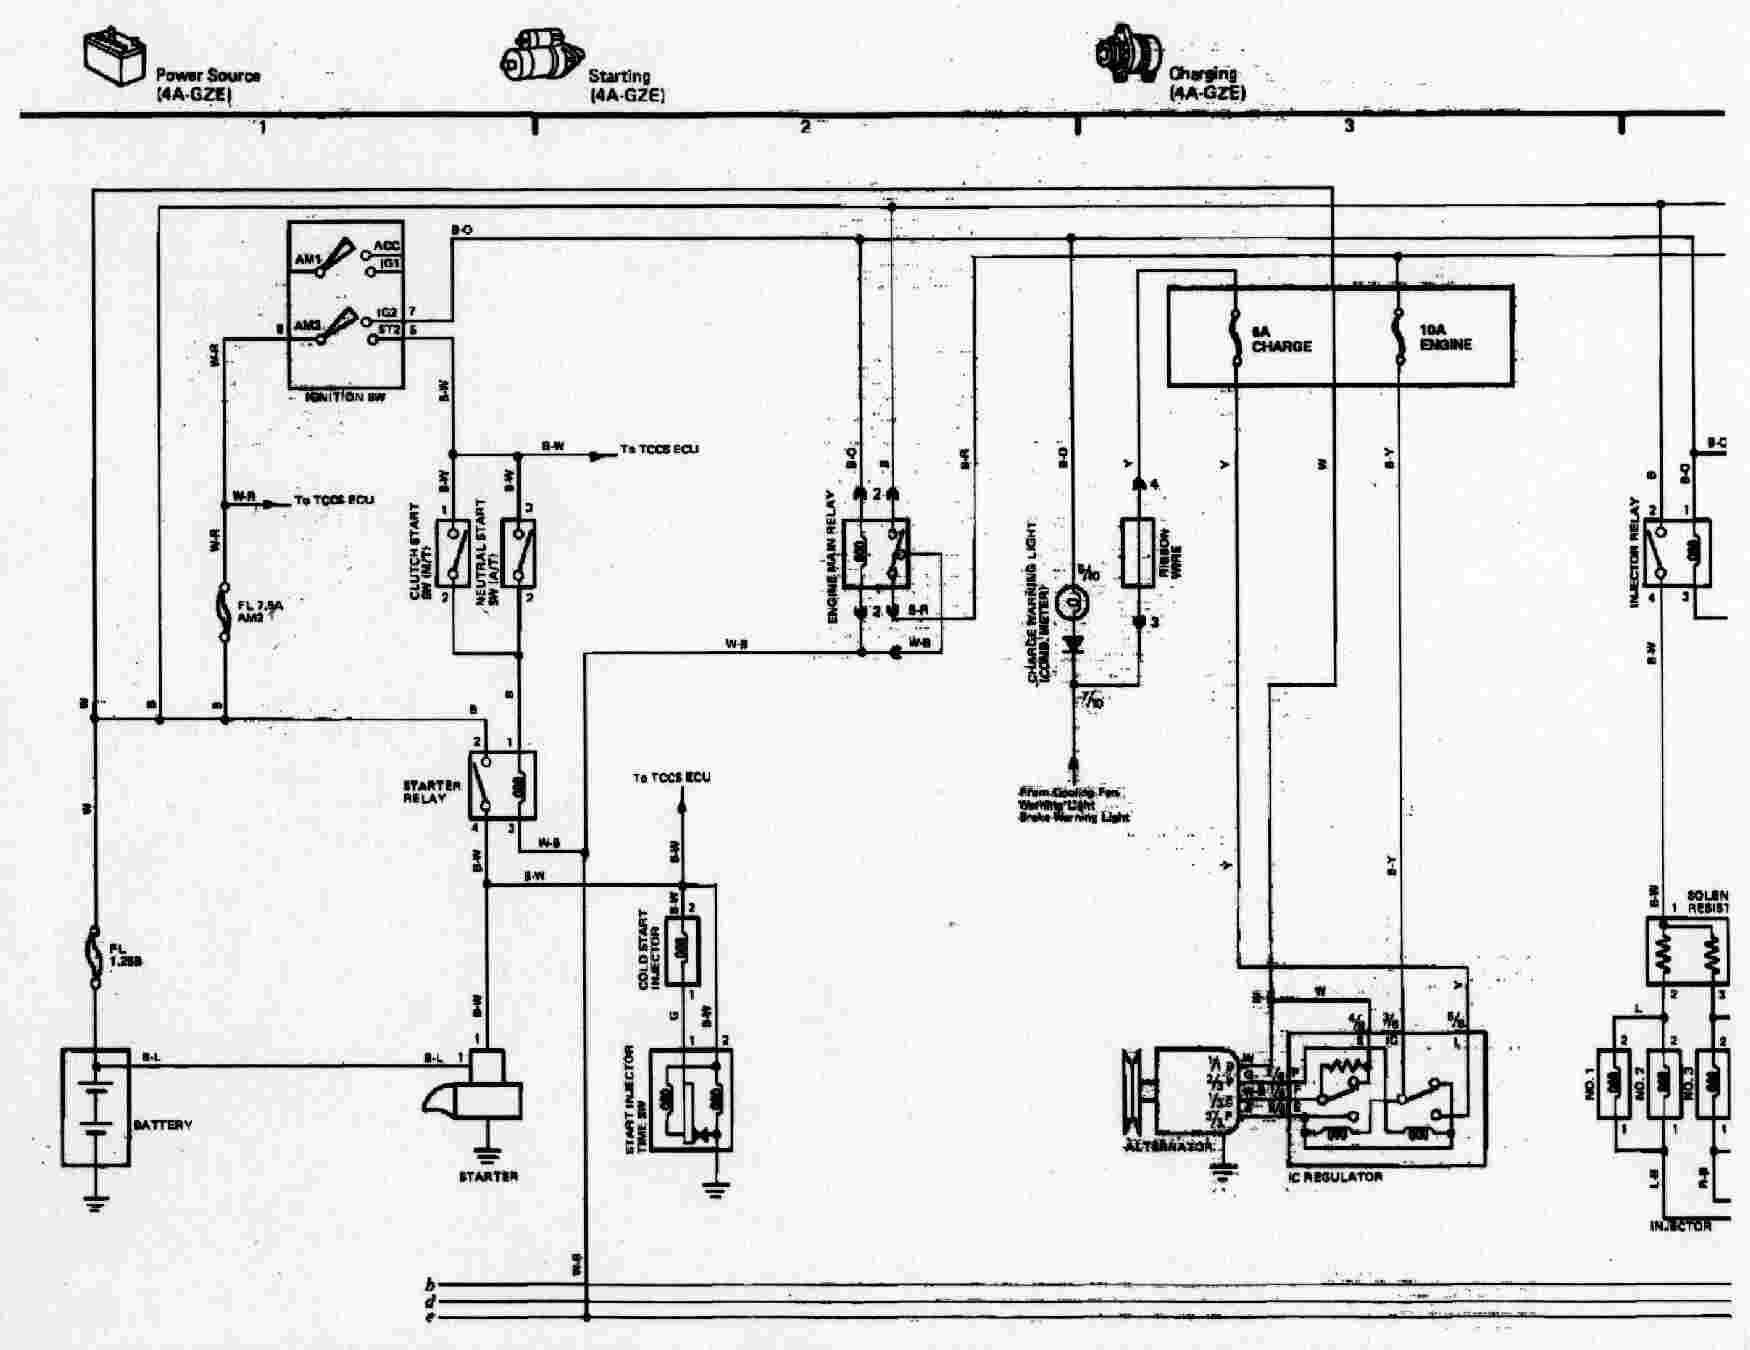 Diagram 1993 Toyota Mr2 Wiring Diagram Full Version Hd Quality Wiring Diagram Sitexzubia Filmarco It